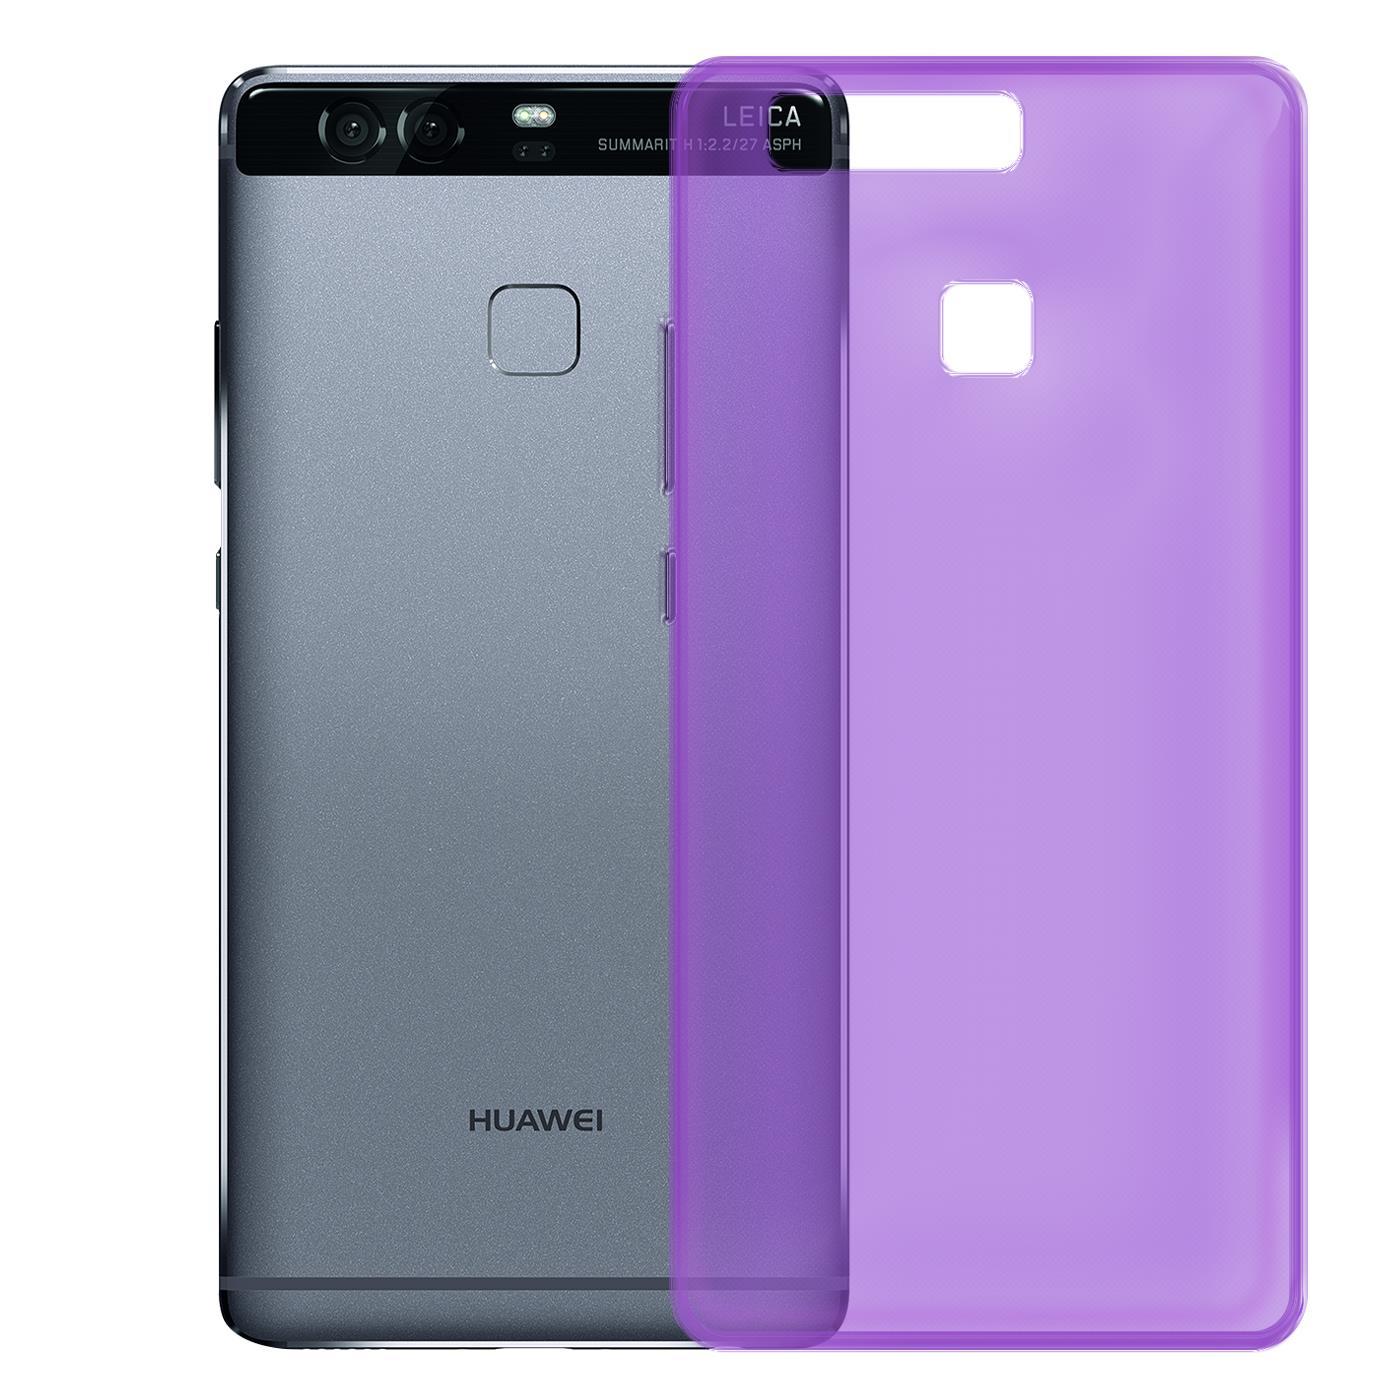 Huawei-p9-Duenn-Silikon-Klar-Case-Cover-Ultra-Slim-Stossfeste-Gel-Rueckseite Indexbild 20